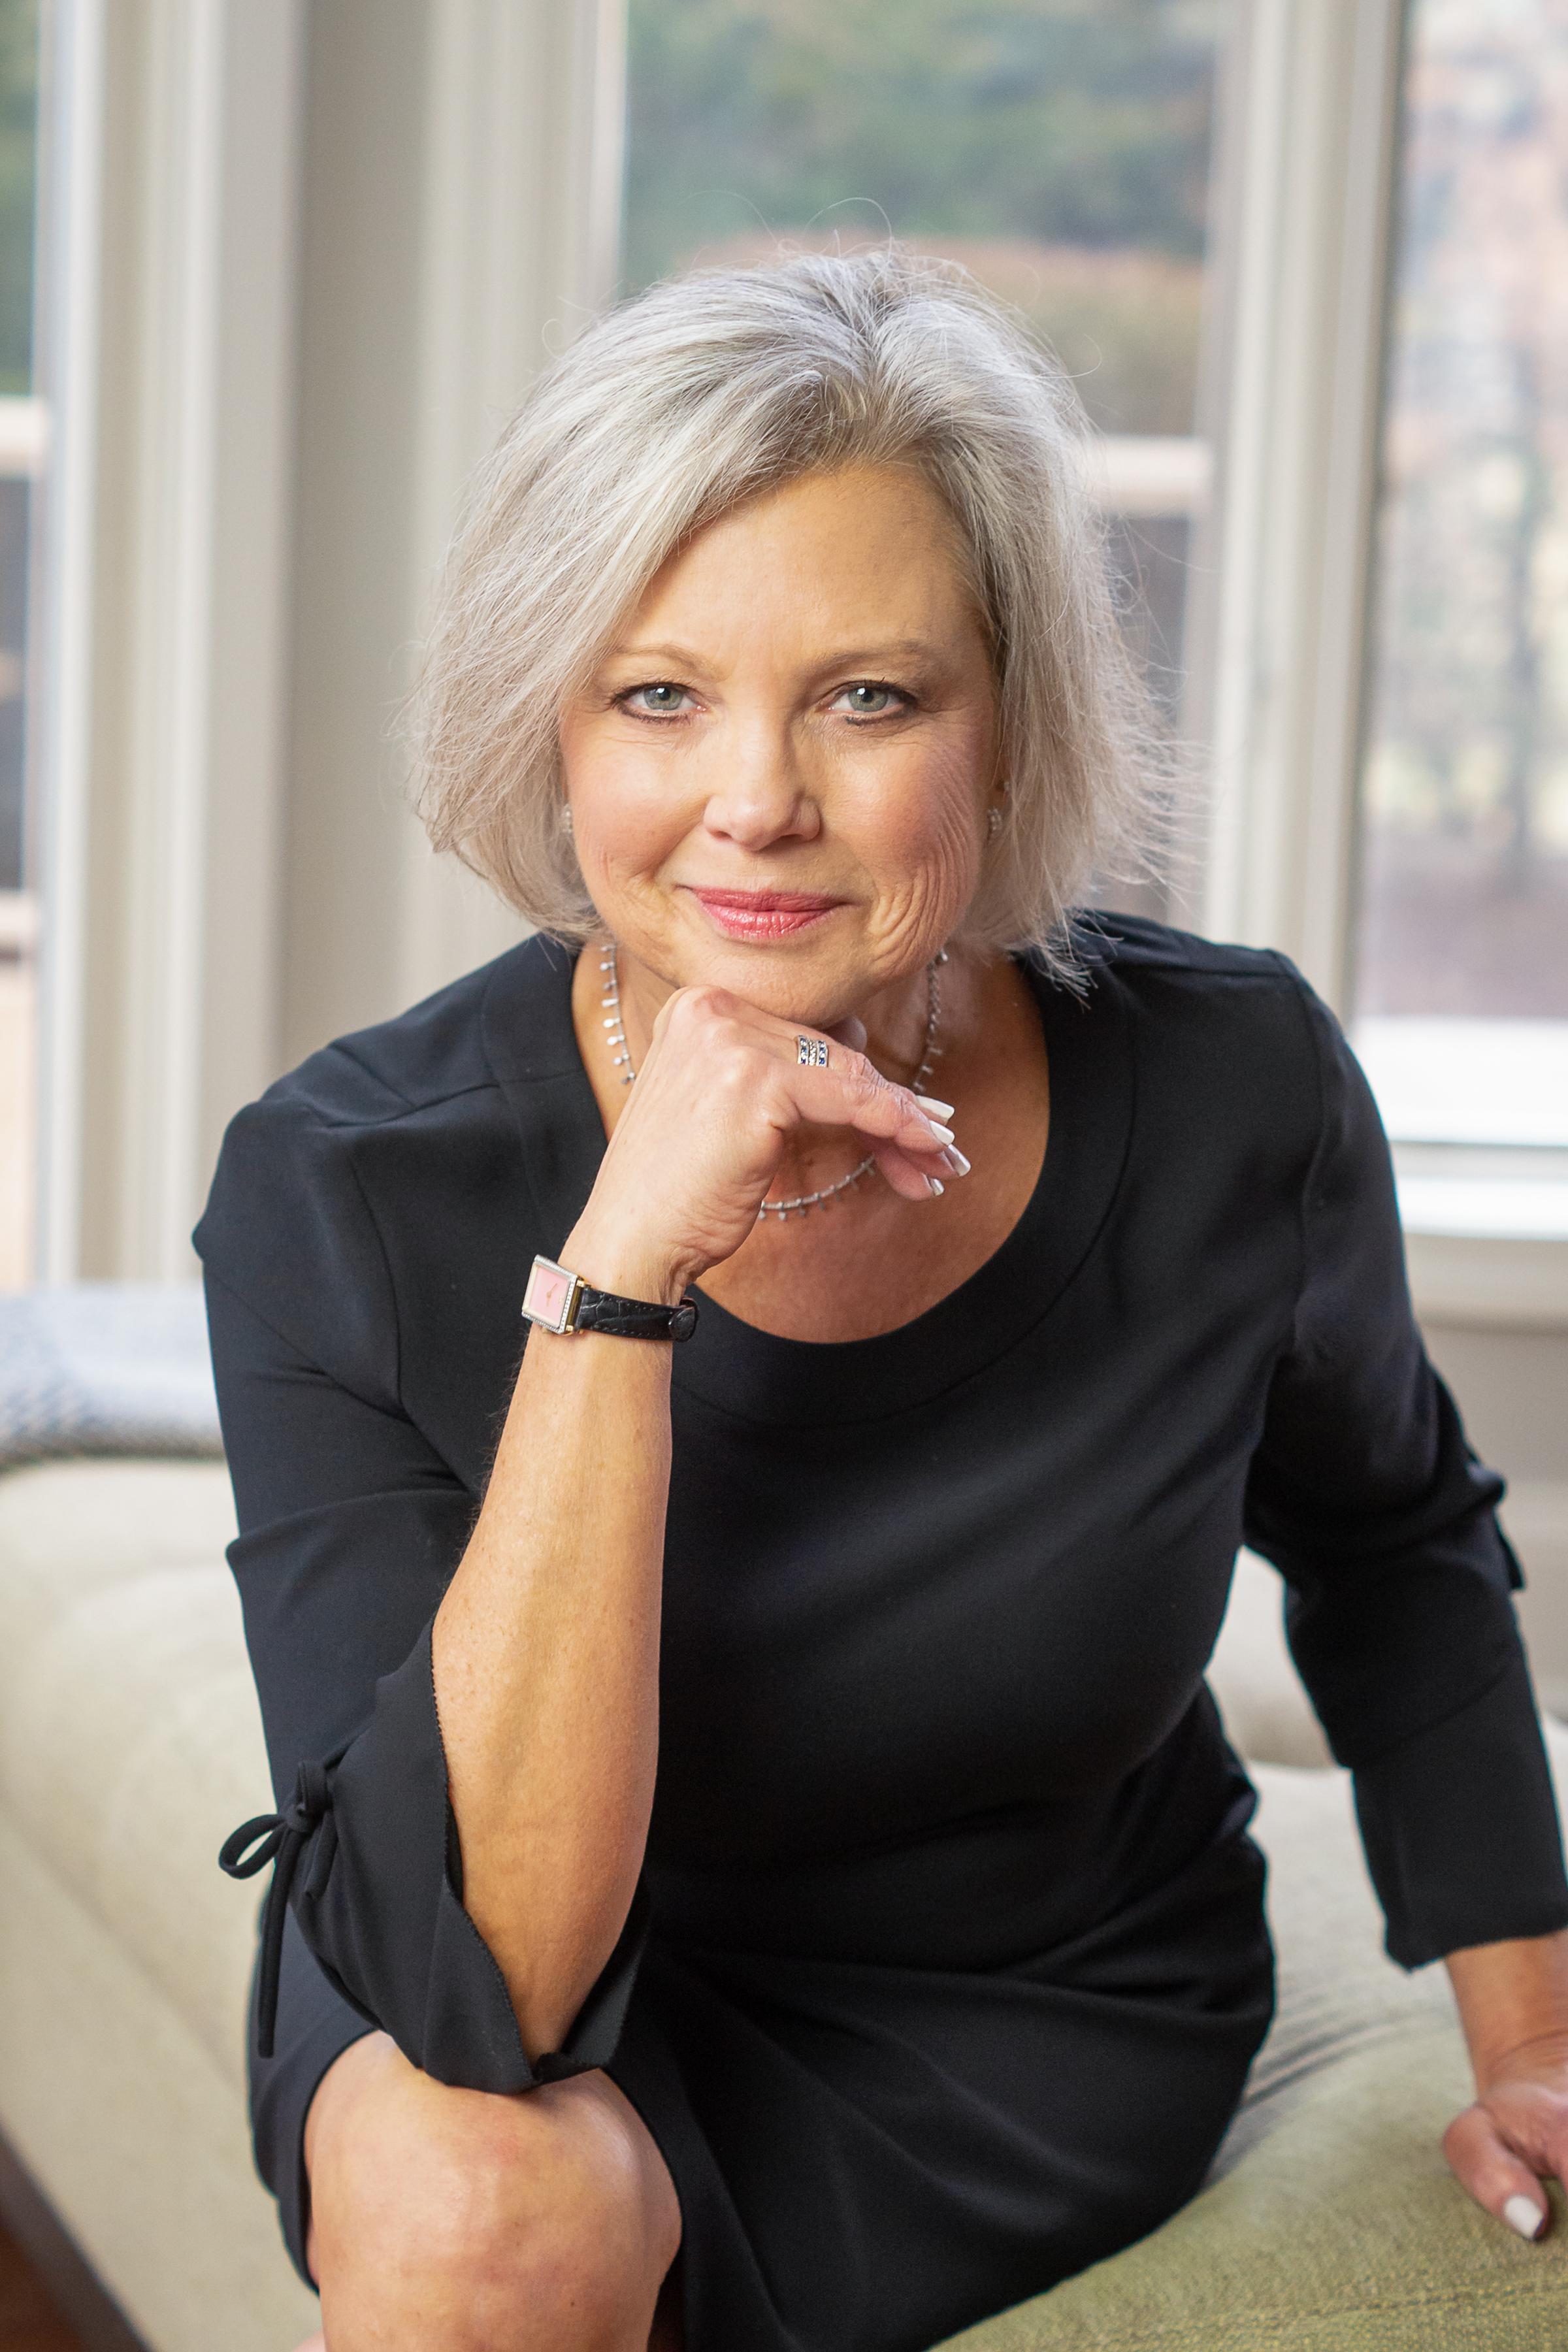 Heidi Seagren